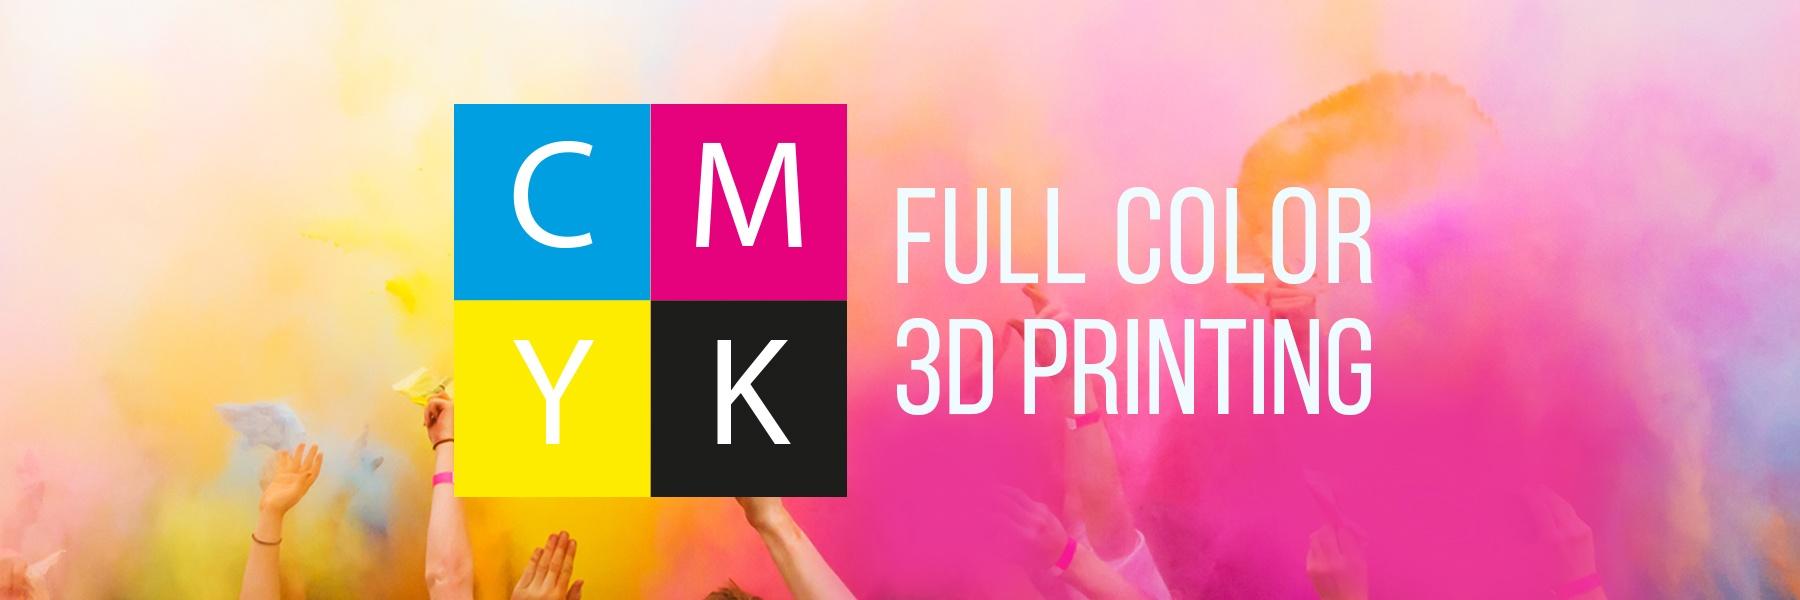 Cometrue3D CMYK Full Color Printing